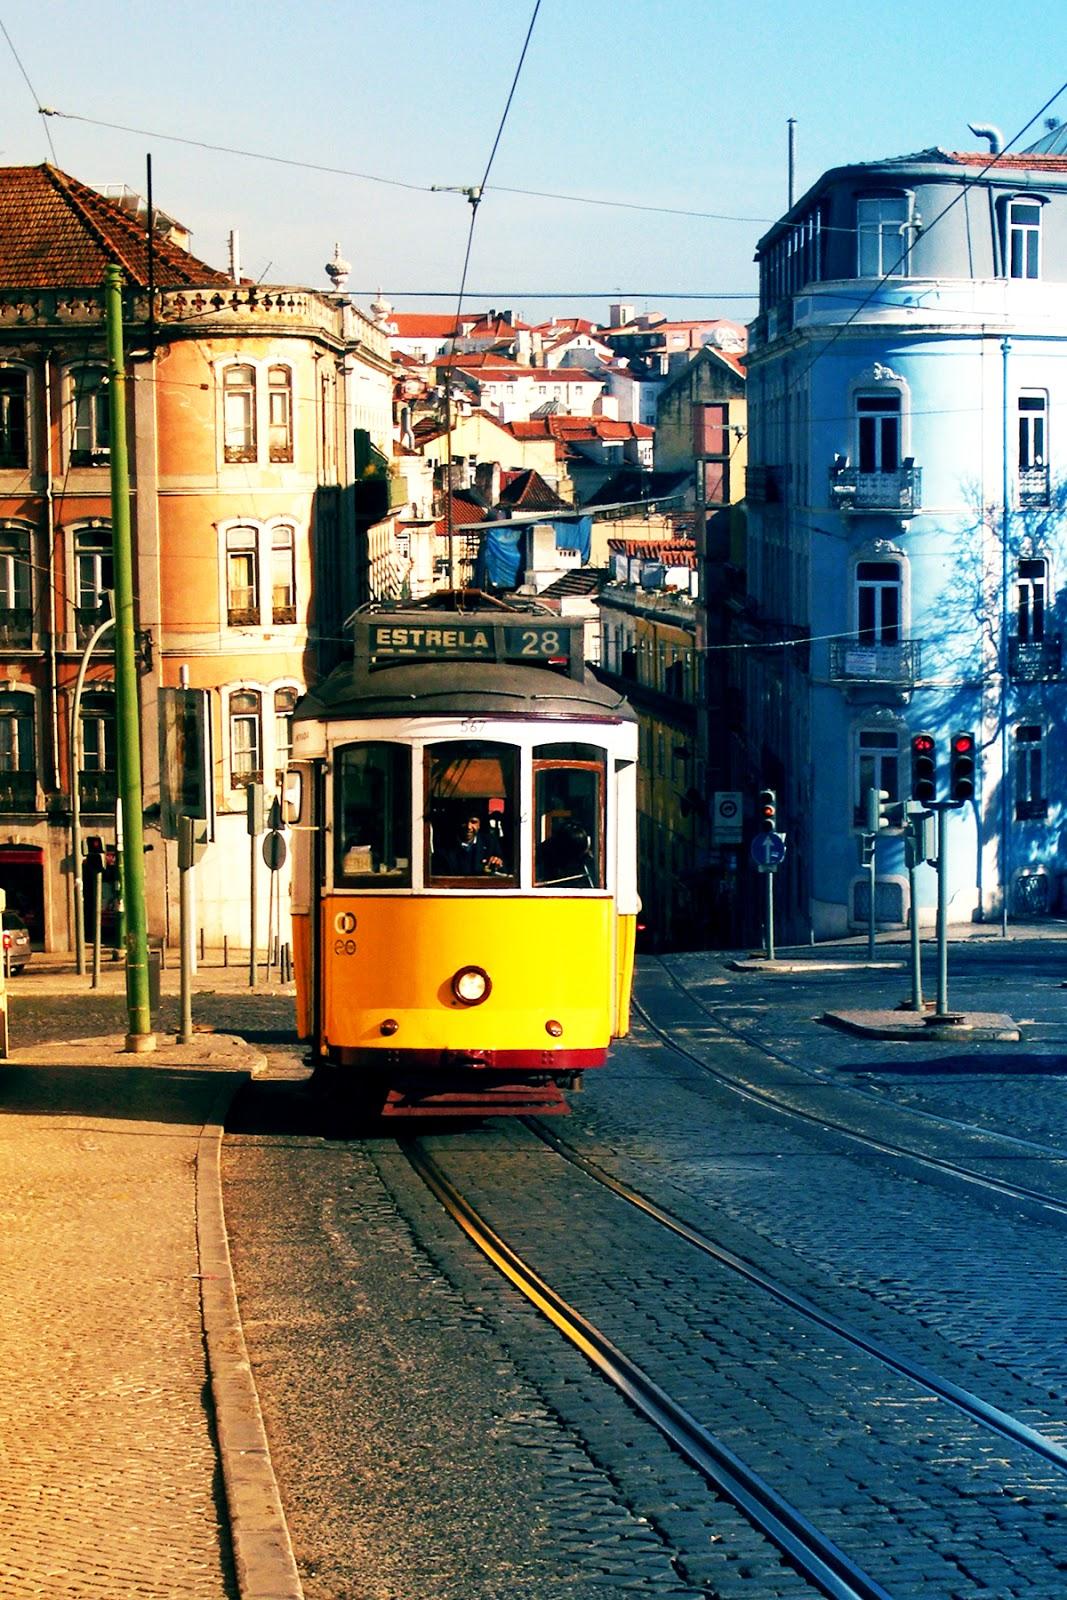 Tram Estrella 28, Lisbon, Portugal